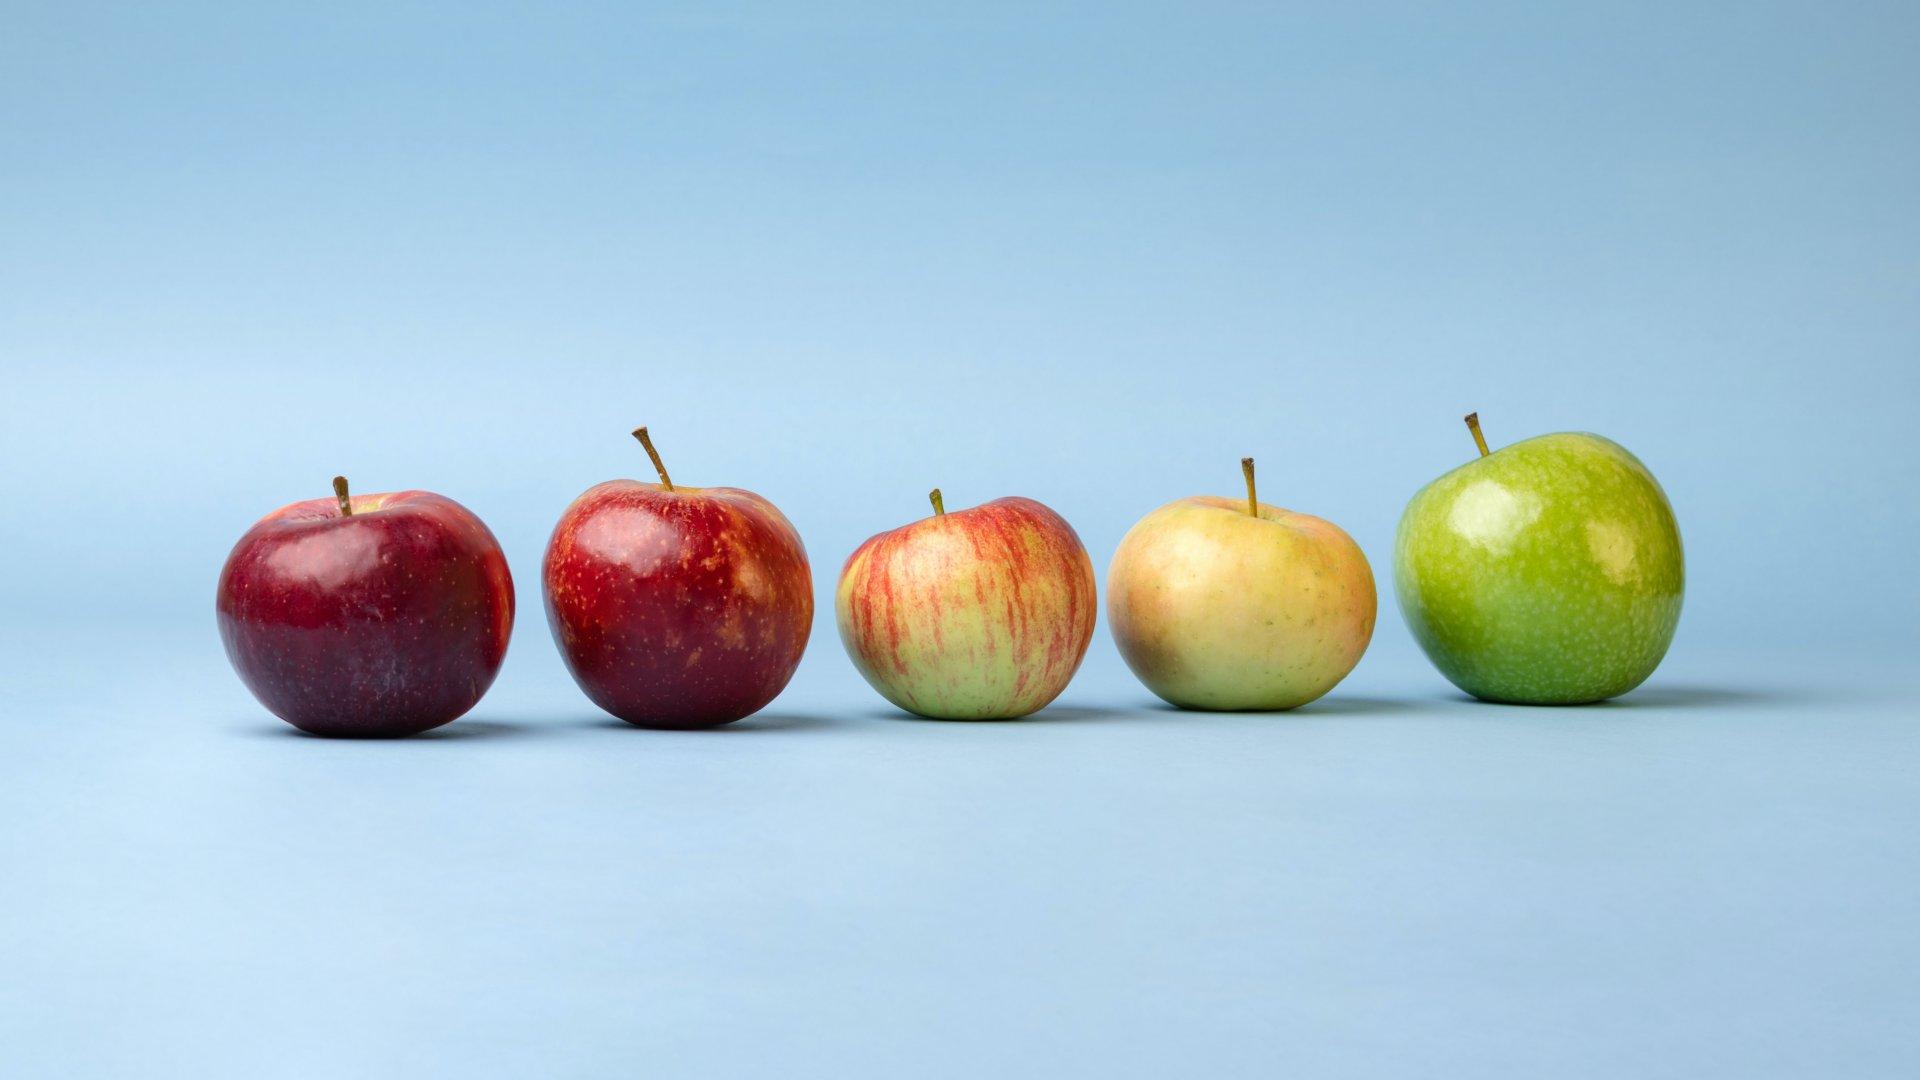 Különböző almafajták